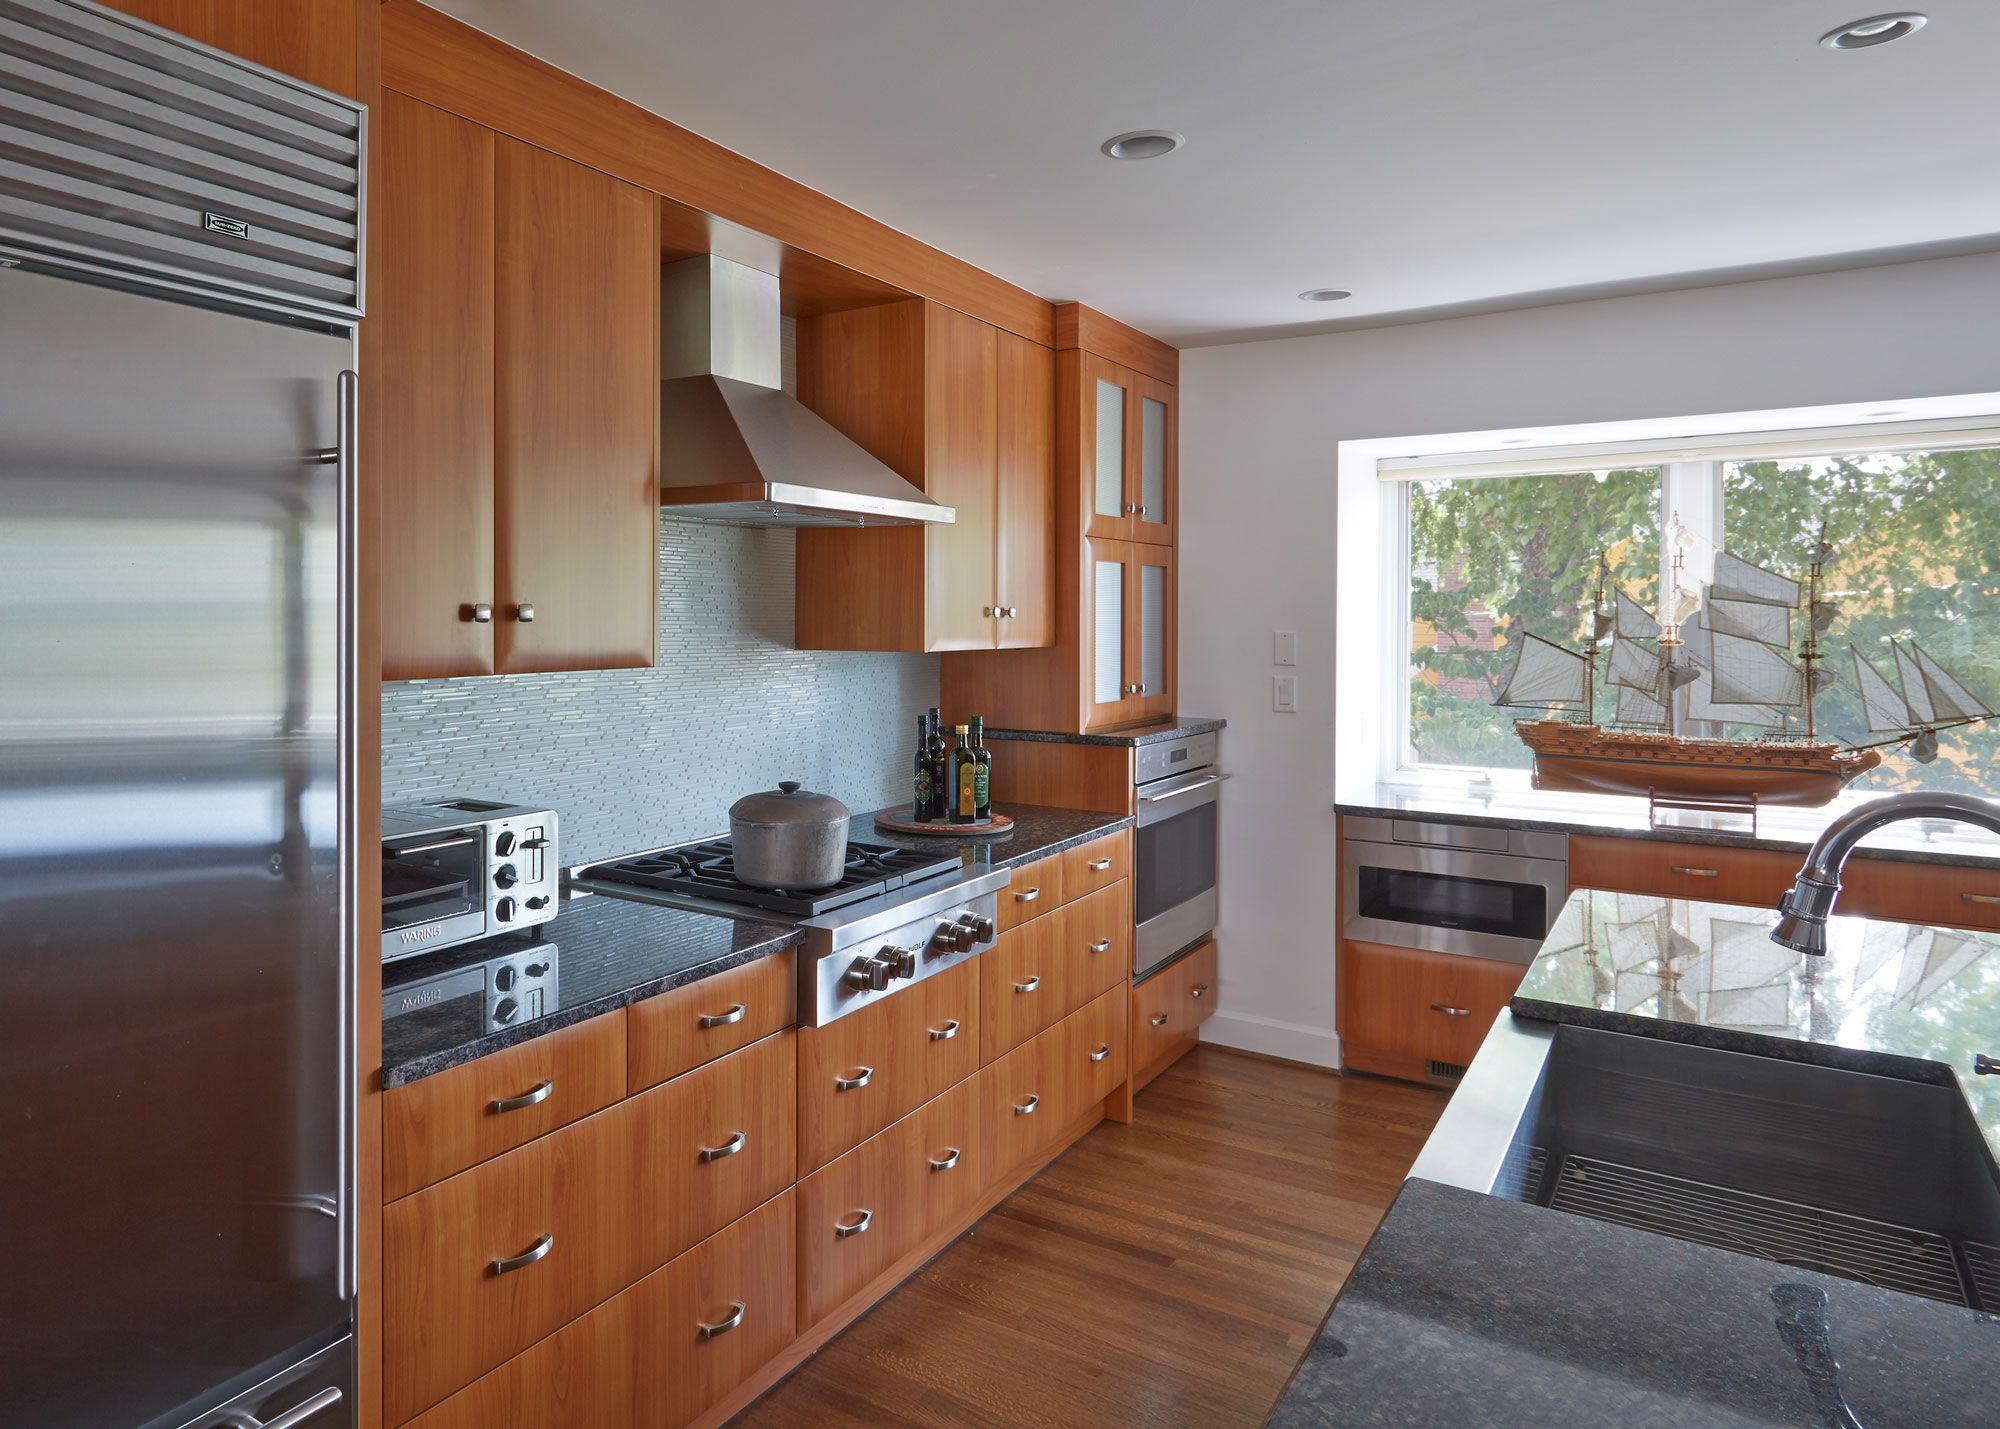 medium kitchen third place name mark t white ckd cbd photo mike kaskel design on t kitchen layout id=73197